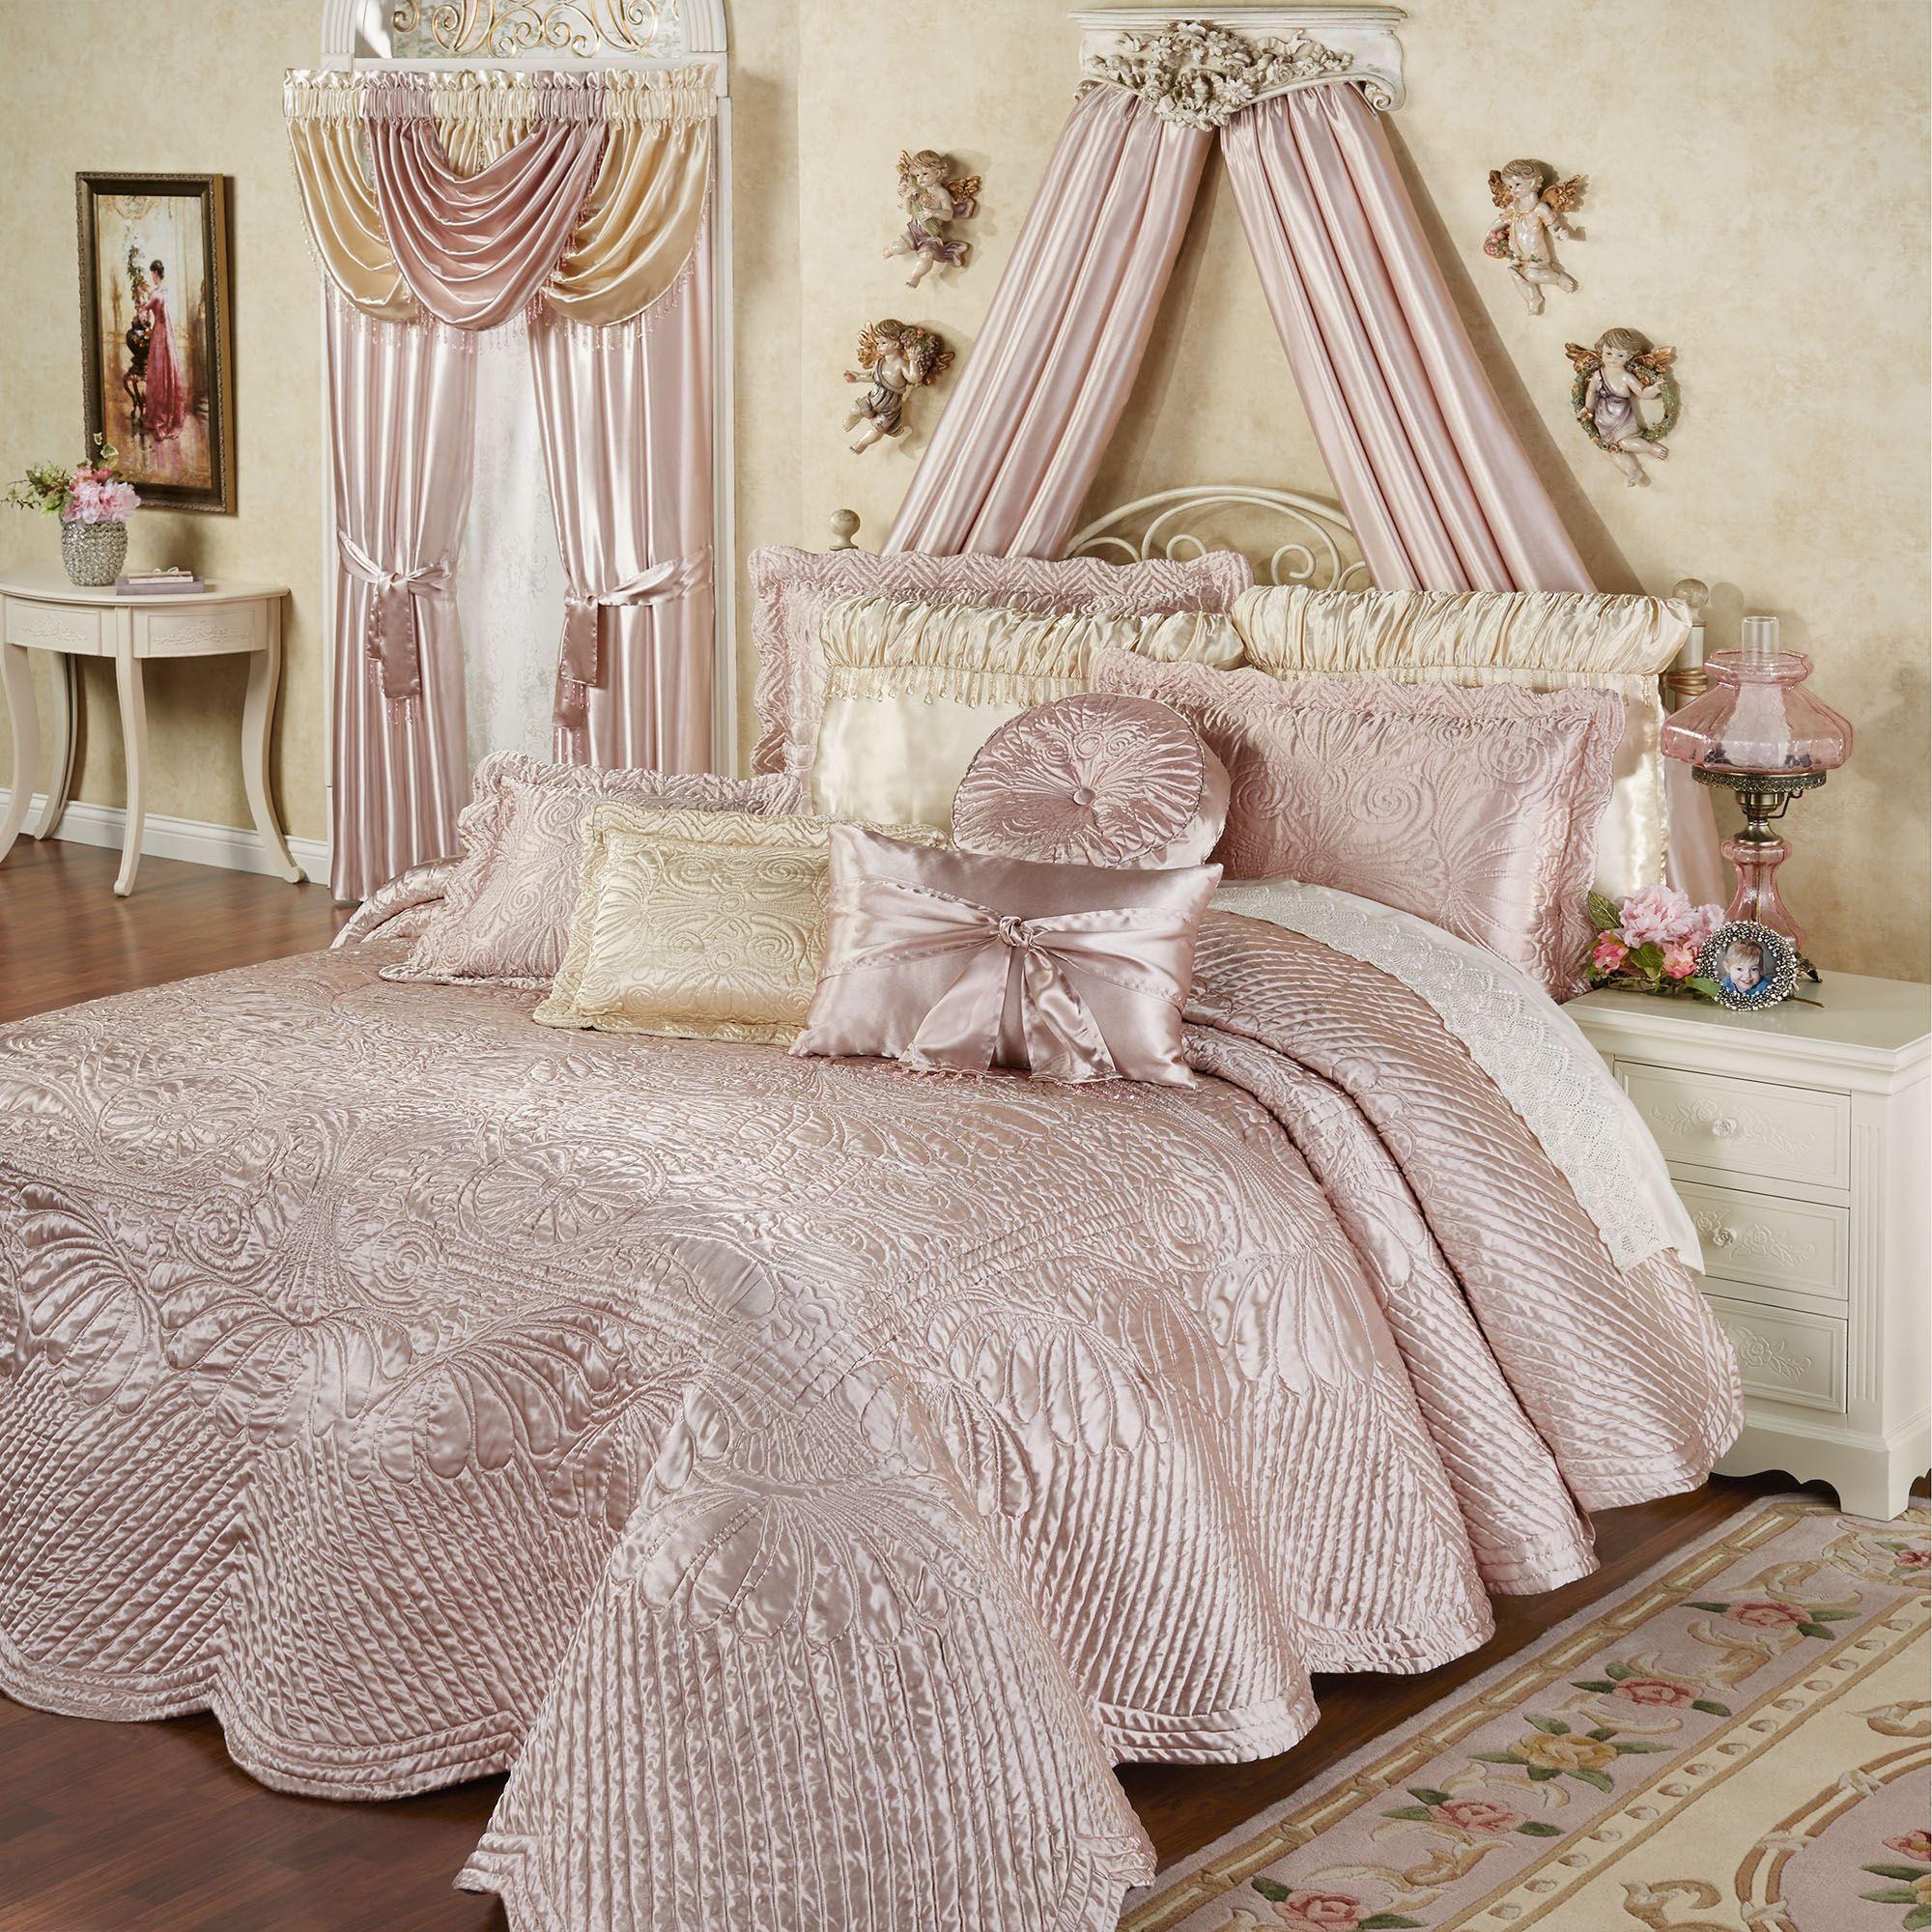 Portia Ii Rose Quartz Quilted Oversized Bedspread Bedding